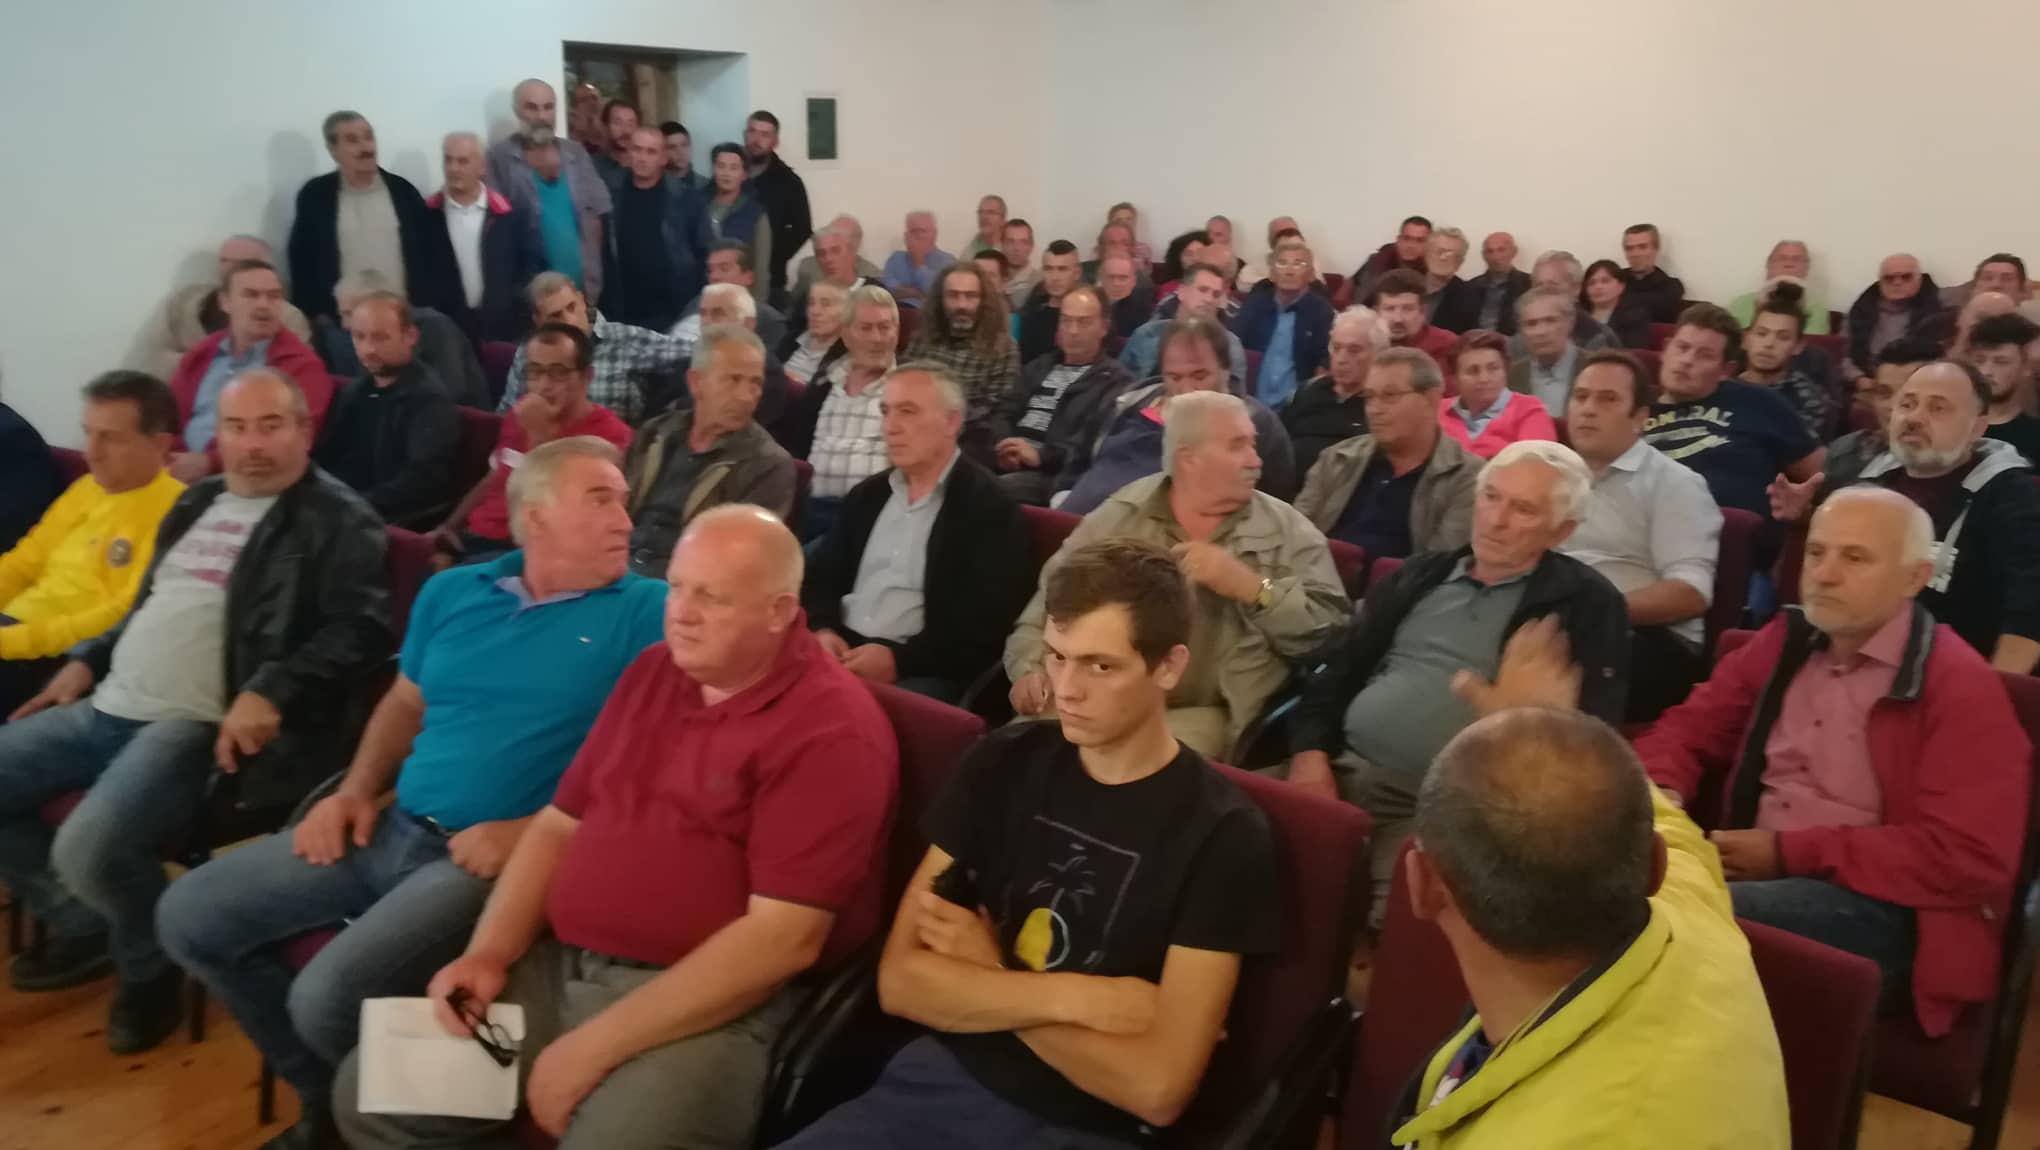 kozan.gr: Τσοτύλι: Συνάντηση με θέμα την επίλυση του προβλήματος της ξύλευσης για τη φετινή χειμερινή περίοδο πραγματοποιήθηκε το βράδυ της Παρασκευής 20/9